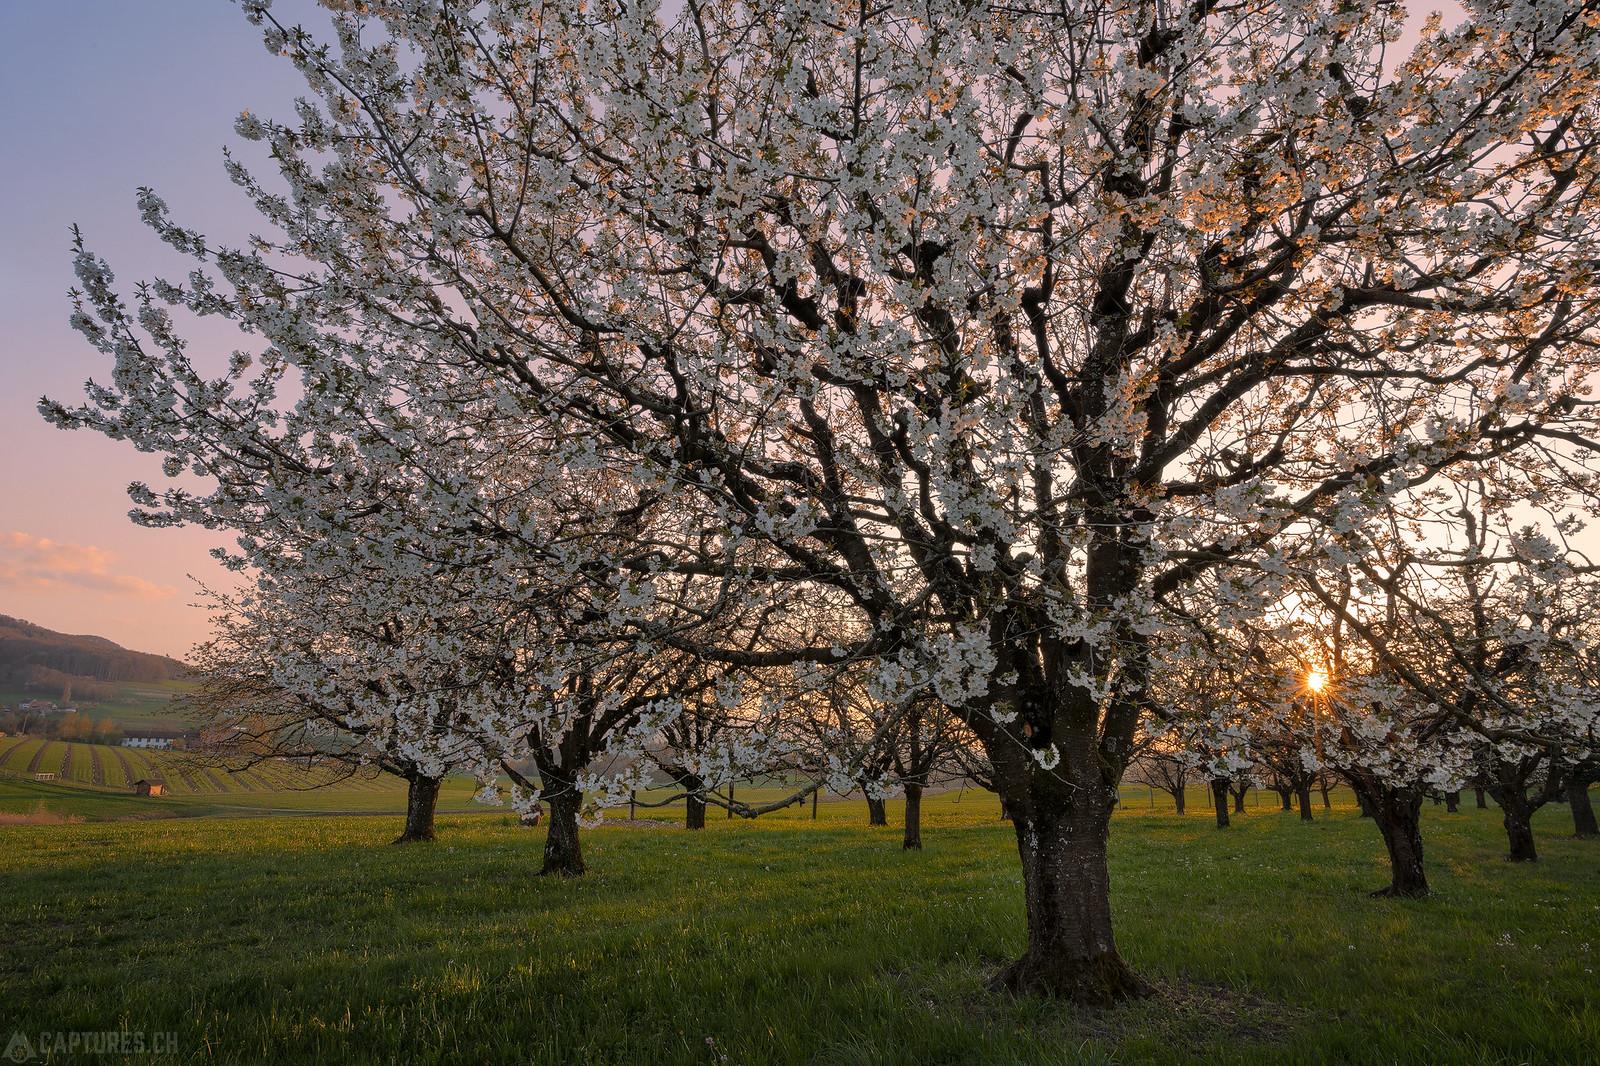 Sunstar in the cherry tree - Rünenberg